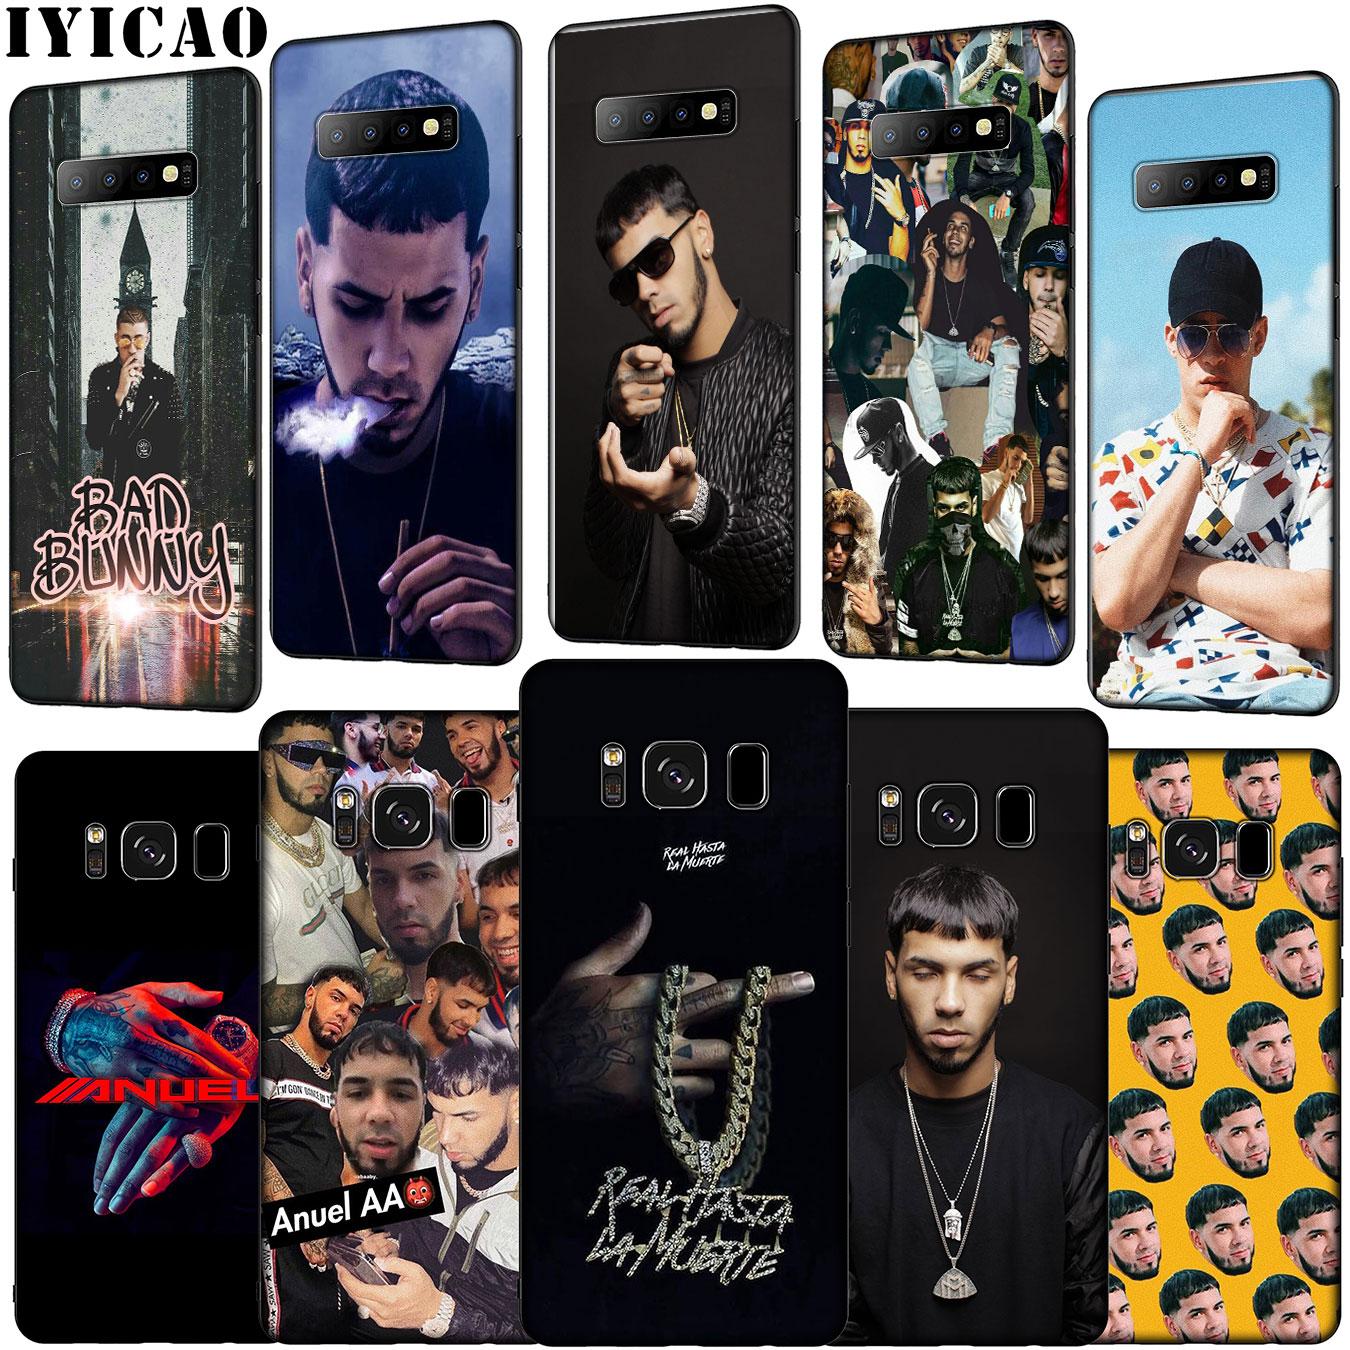 IYICAO Anuel AA conejito malo de silicona suave caso de teléfono para Samsung Galaxy S20 Ultra S10 Lite S9 S8 más S6 S7 borde S10e cubierta